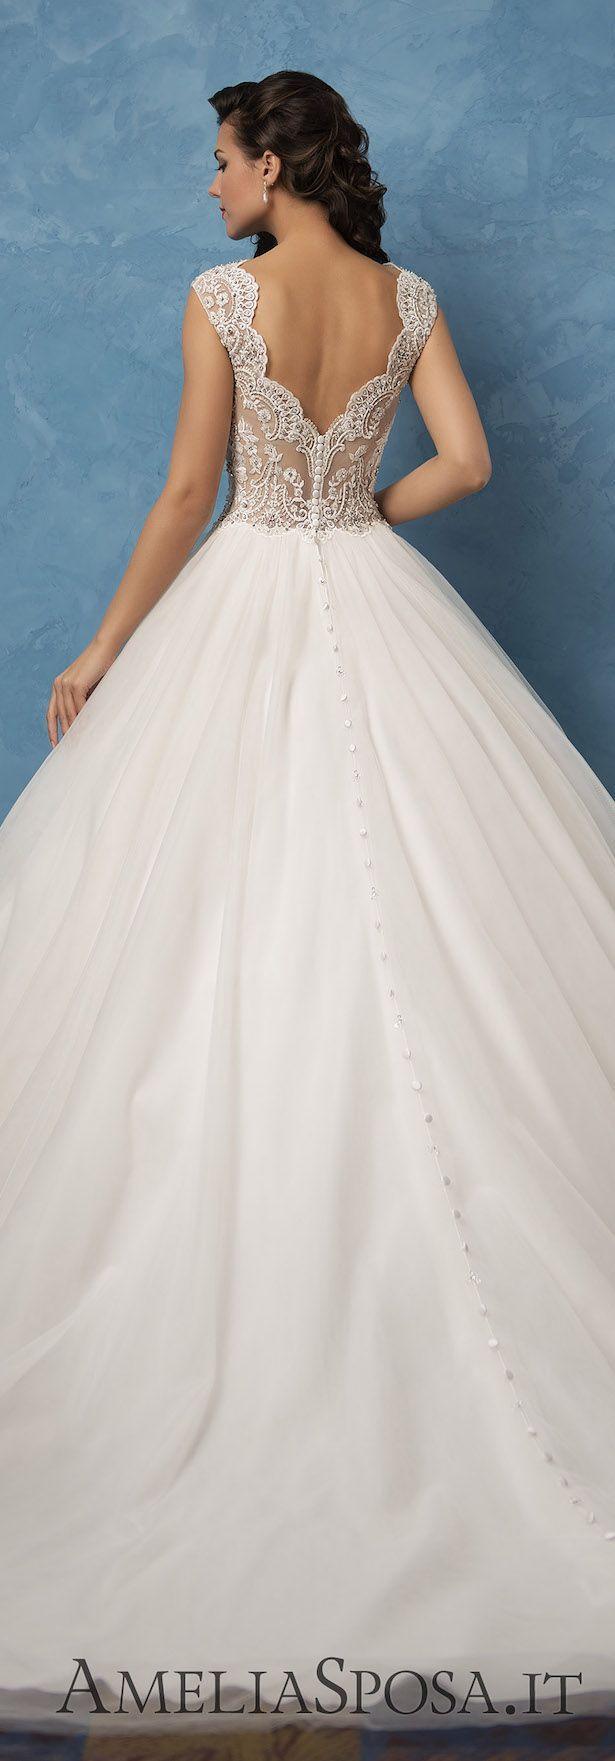 Amelia sposa wedding dresses royal blue collection amelia